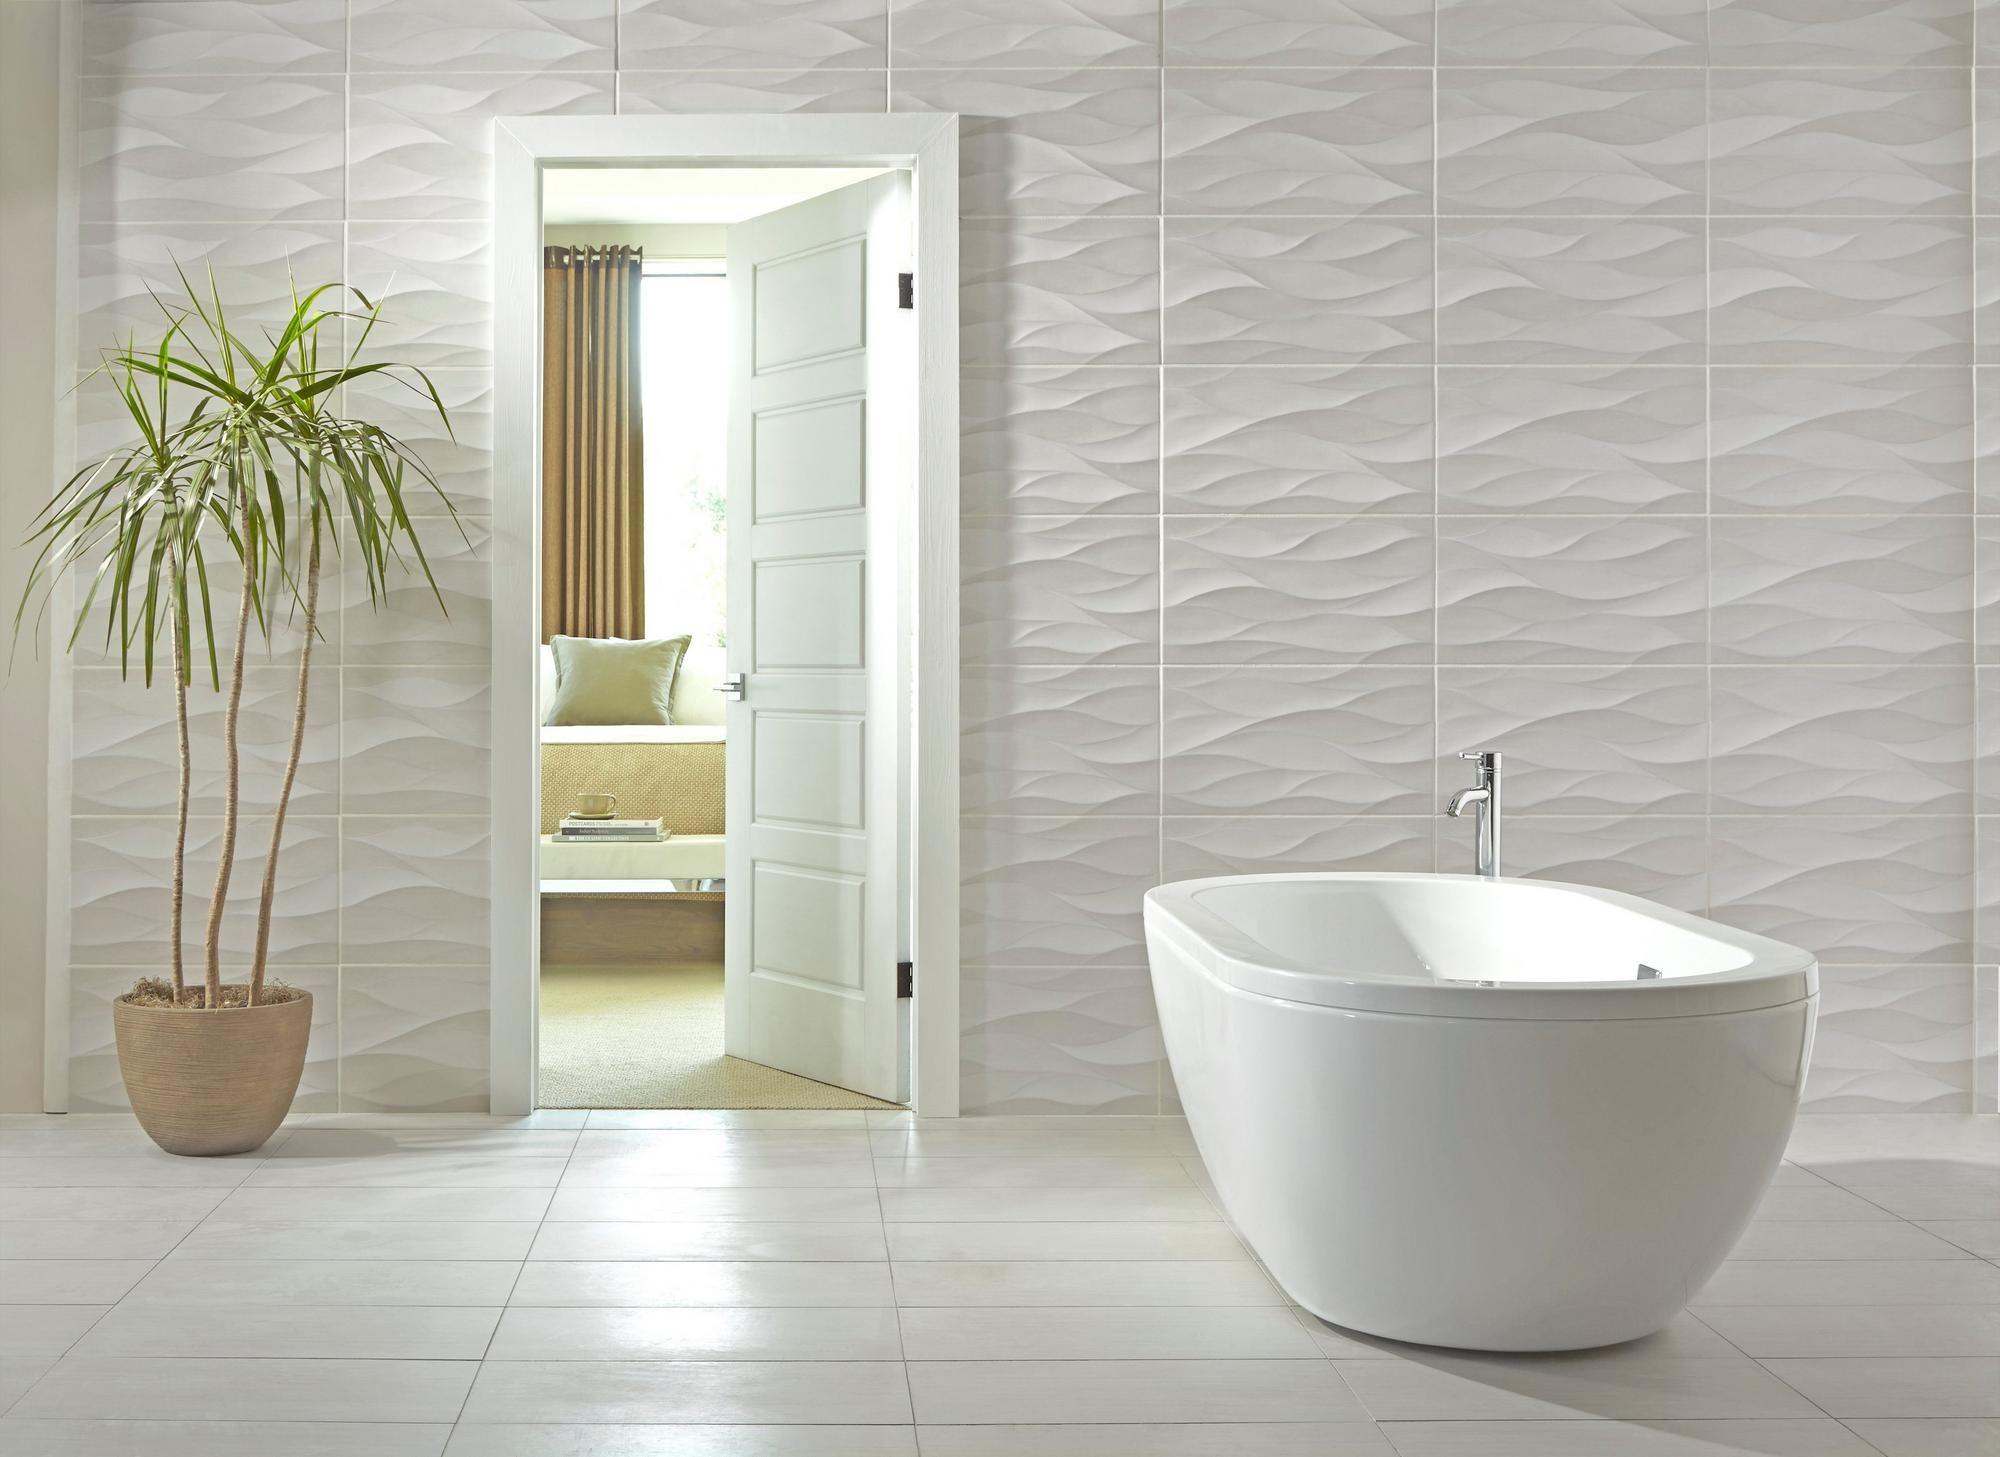 Soho LaFayette Porcelain Tile Ada BathroomBathroom IdeasBathroom